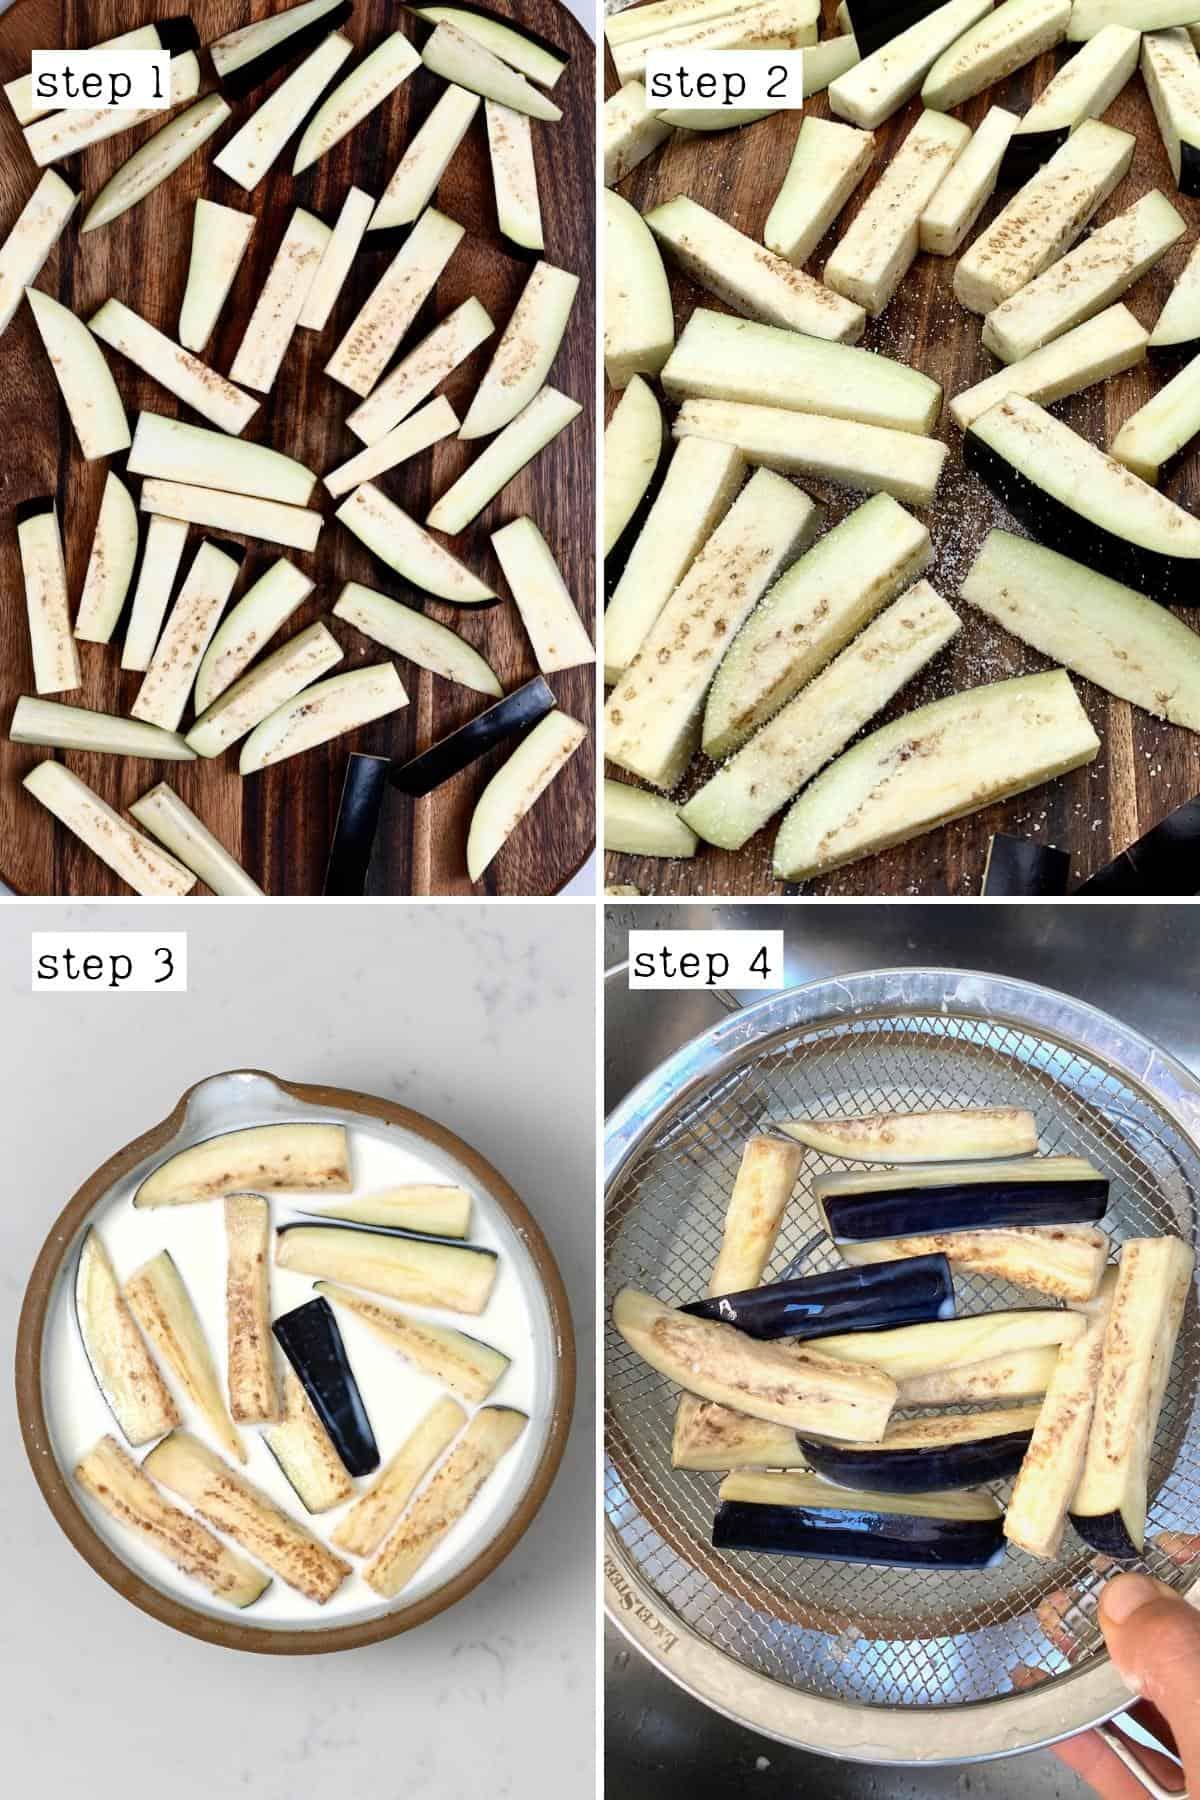 Steps for preparing eggplant chips